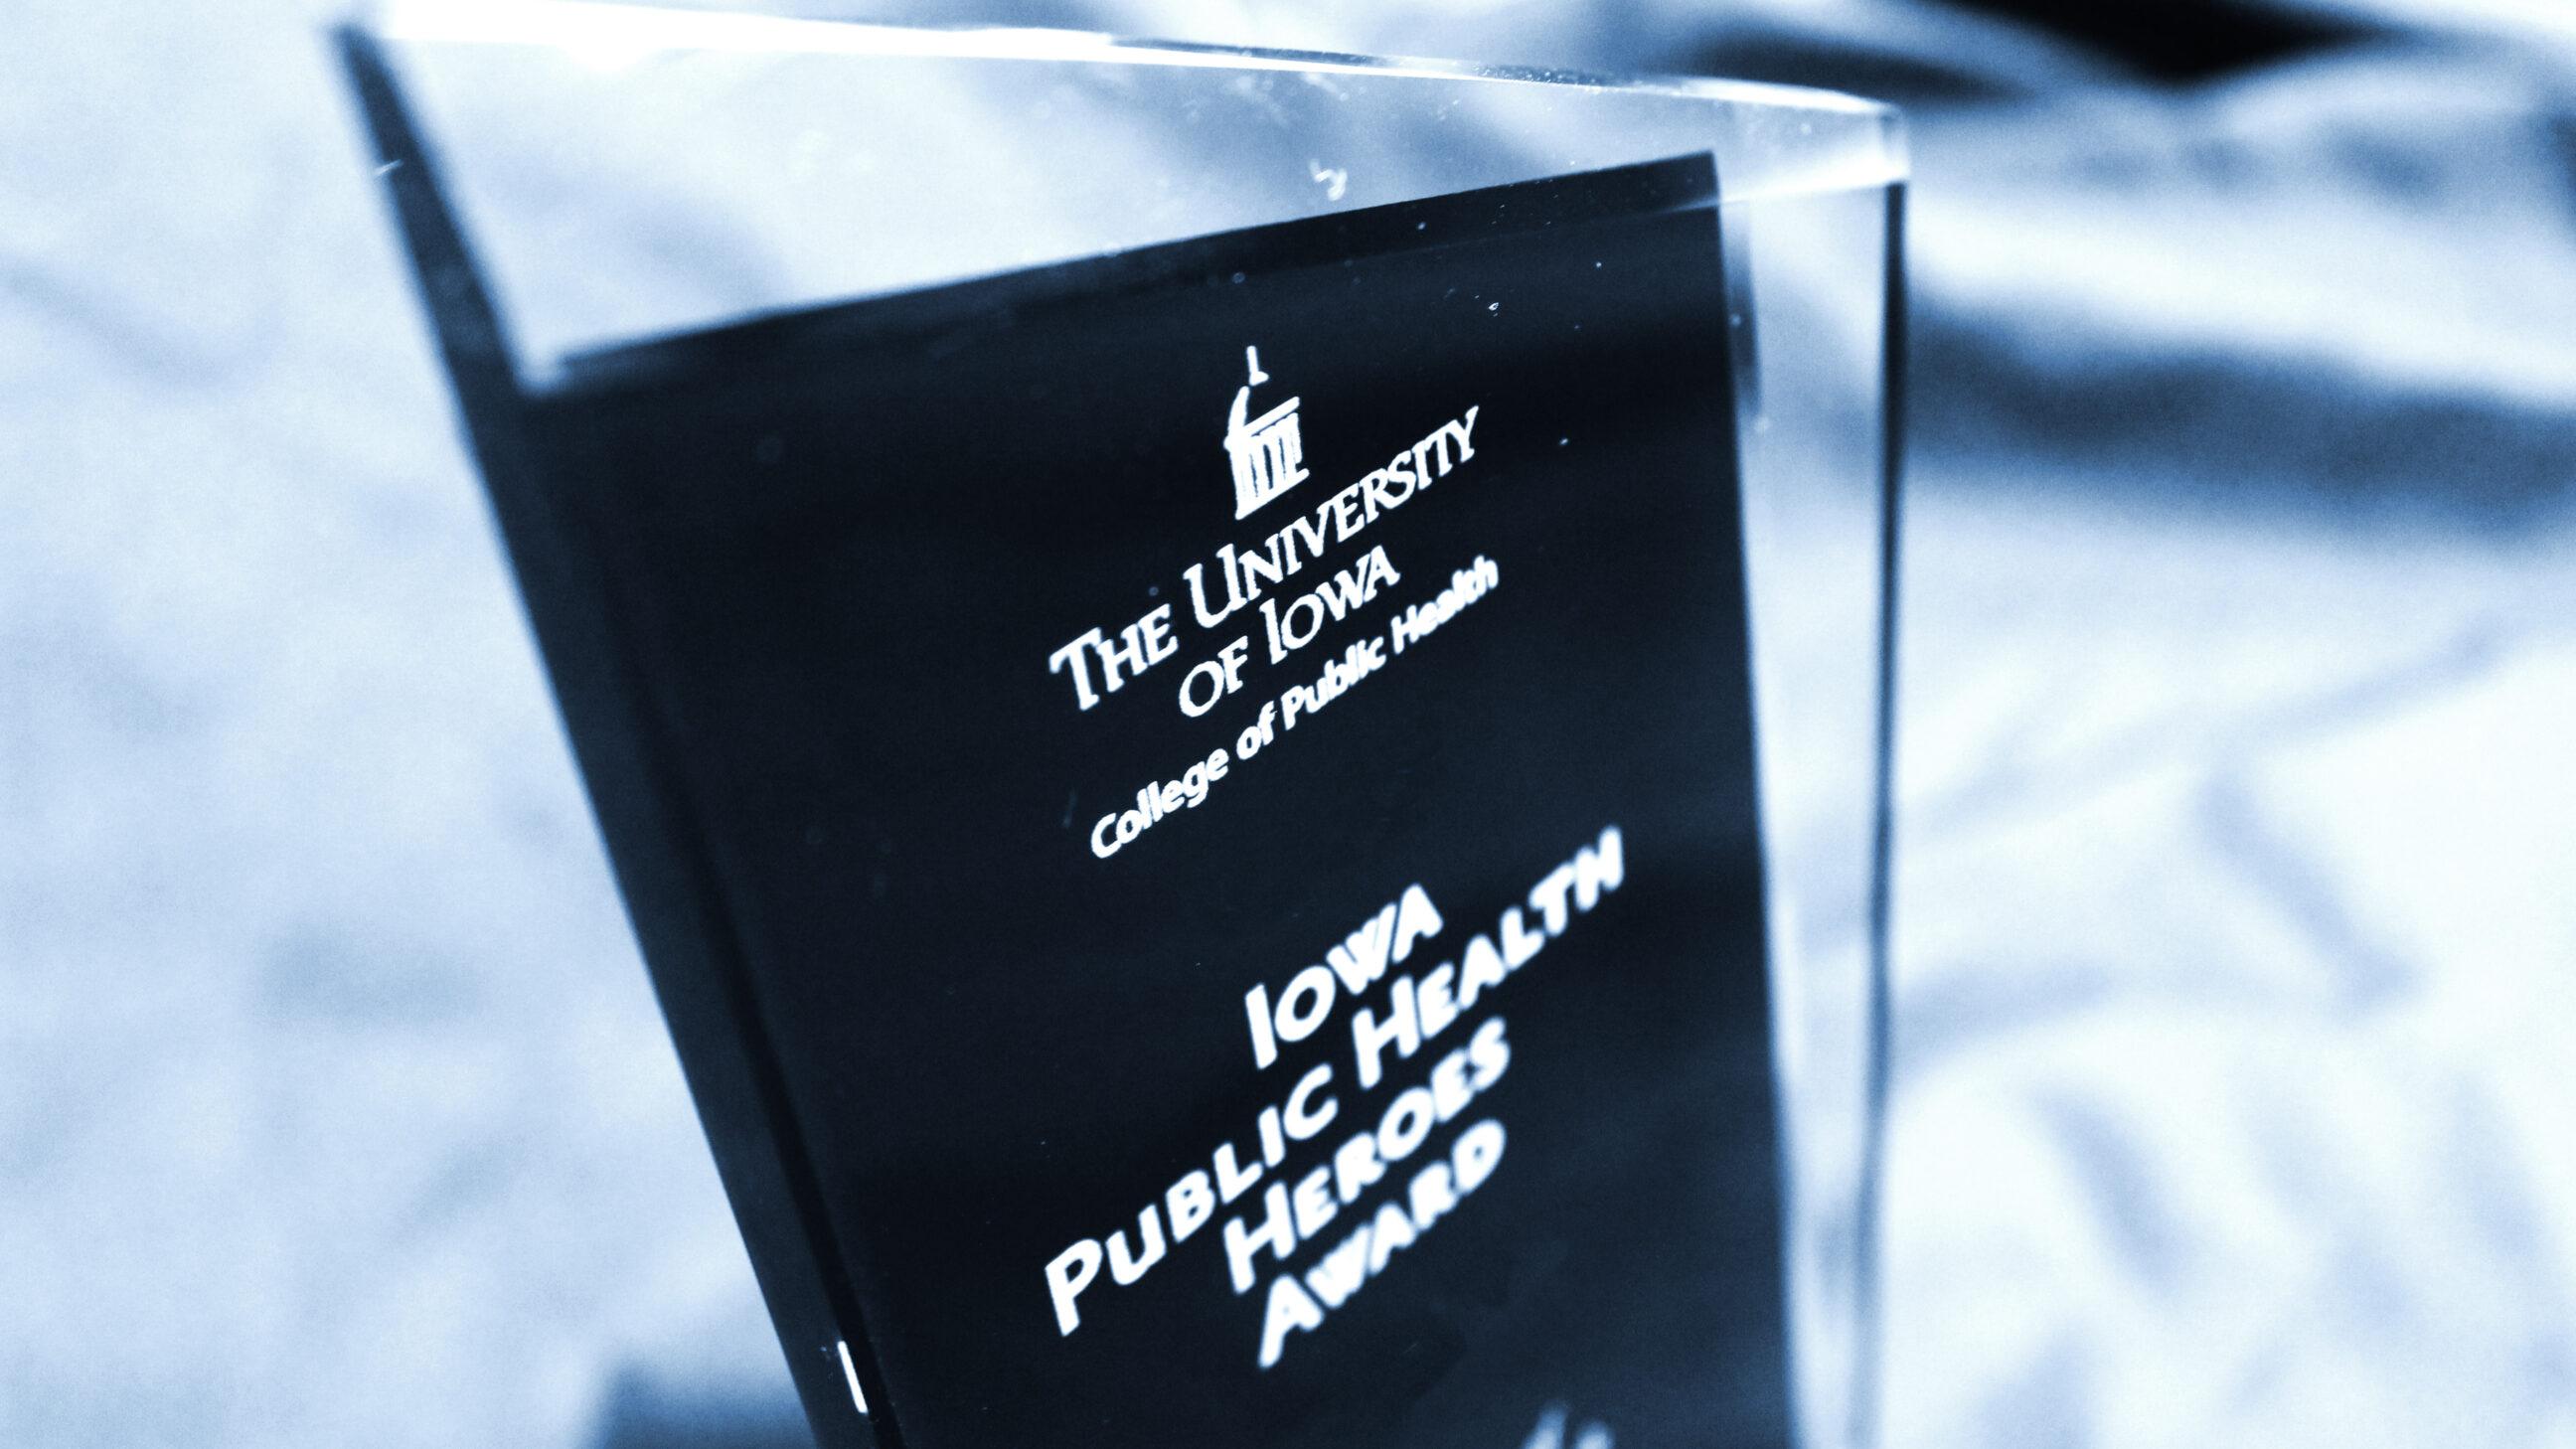 Public Health Heroes Trophy